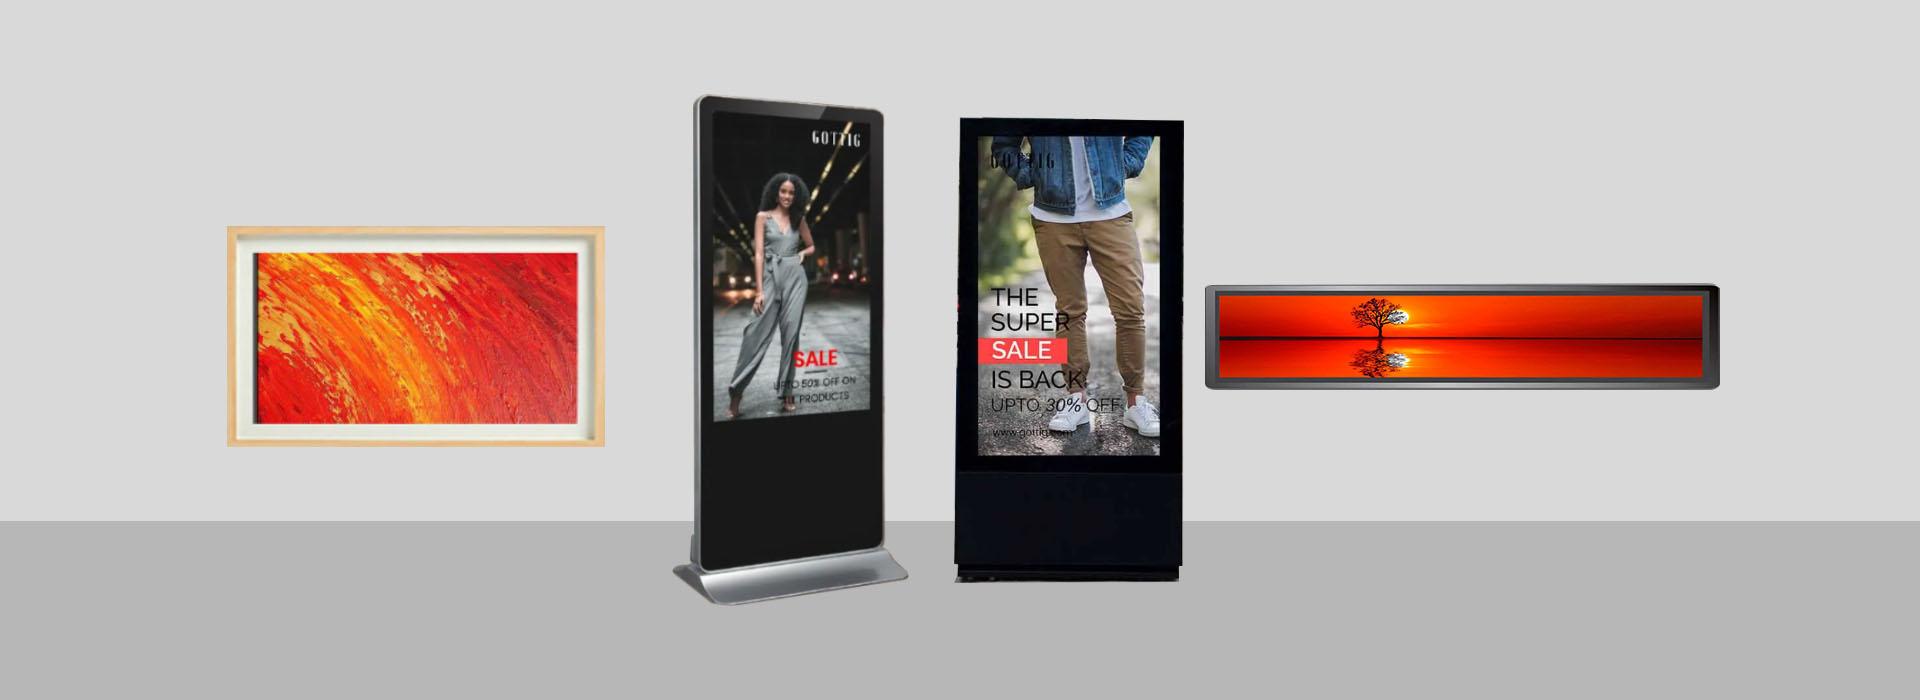 Digital Displays banner